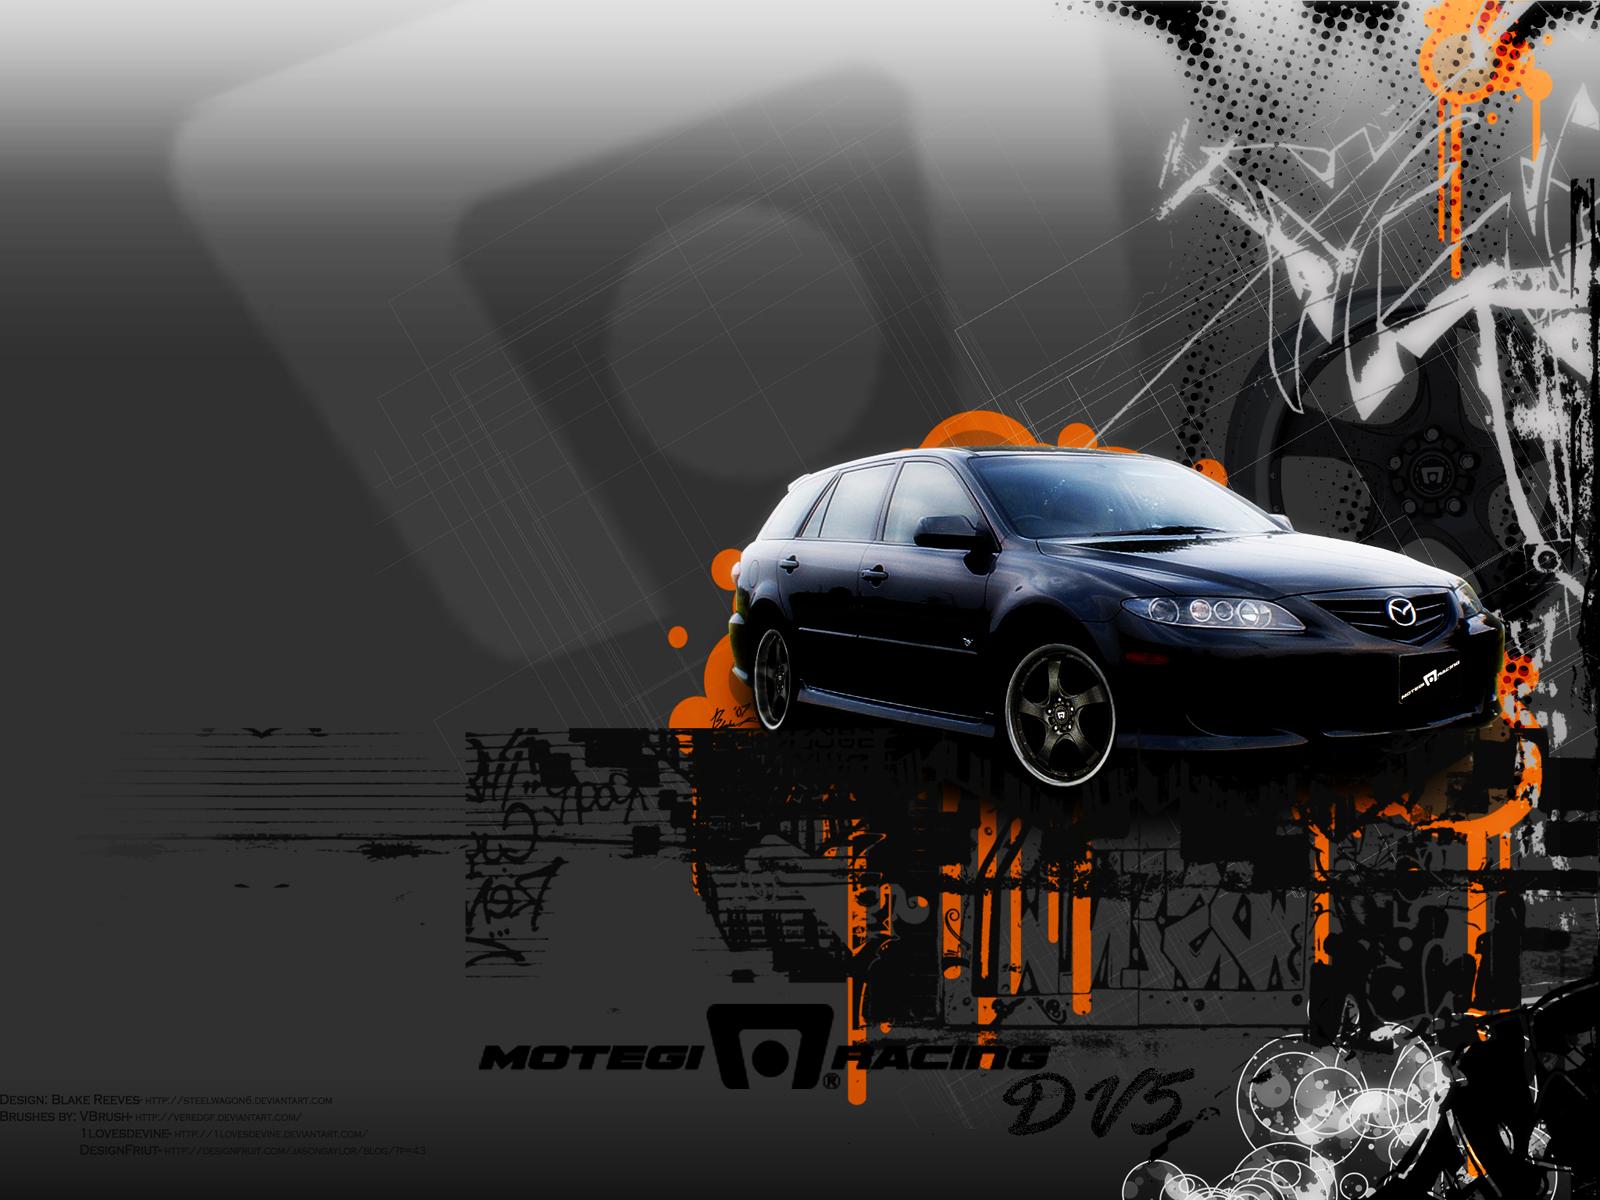 Wallpaper Fox Racing wallpaper 1600x1200